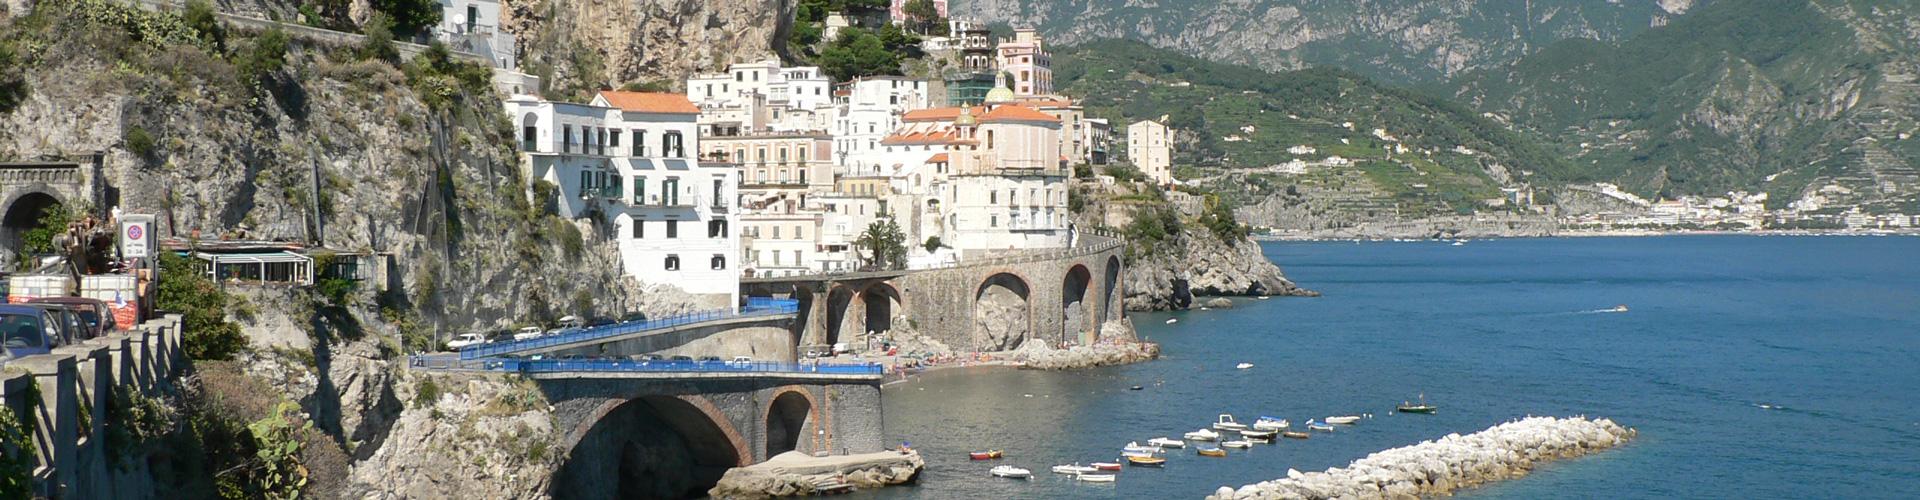 Spirit of Amalfi